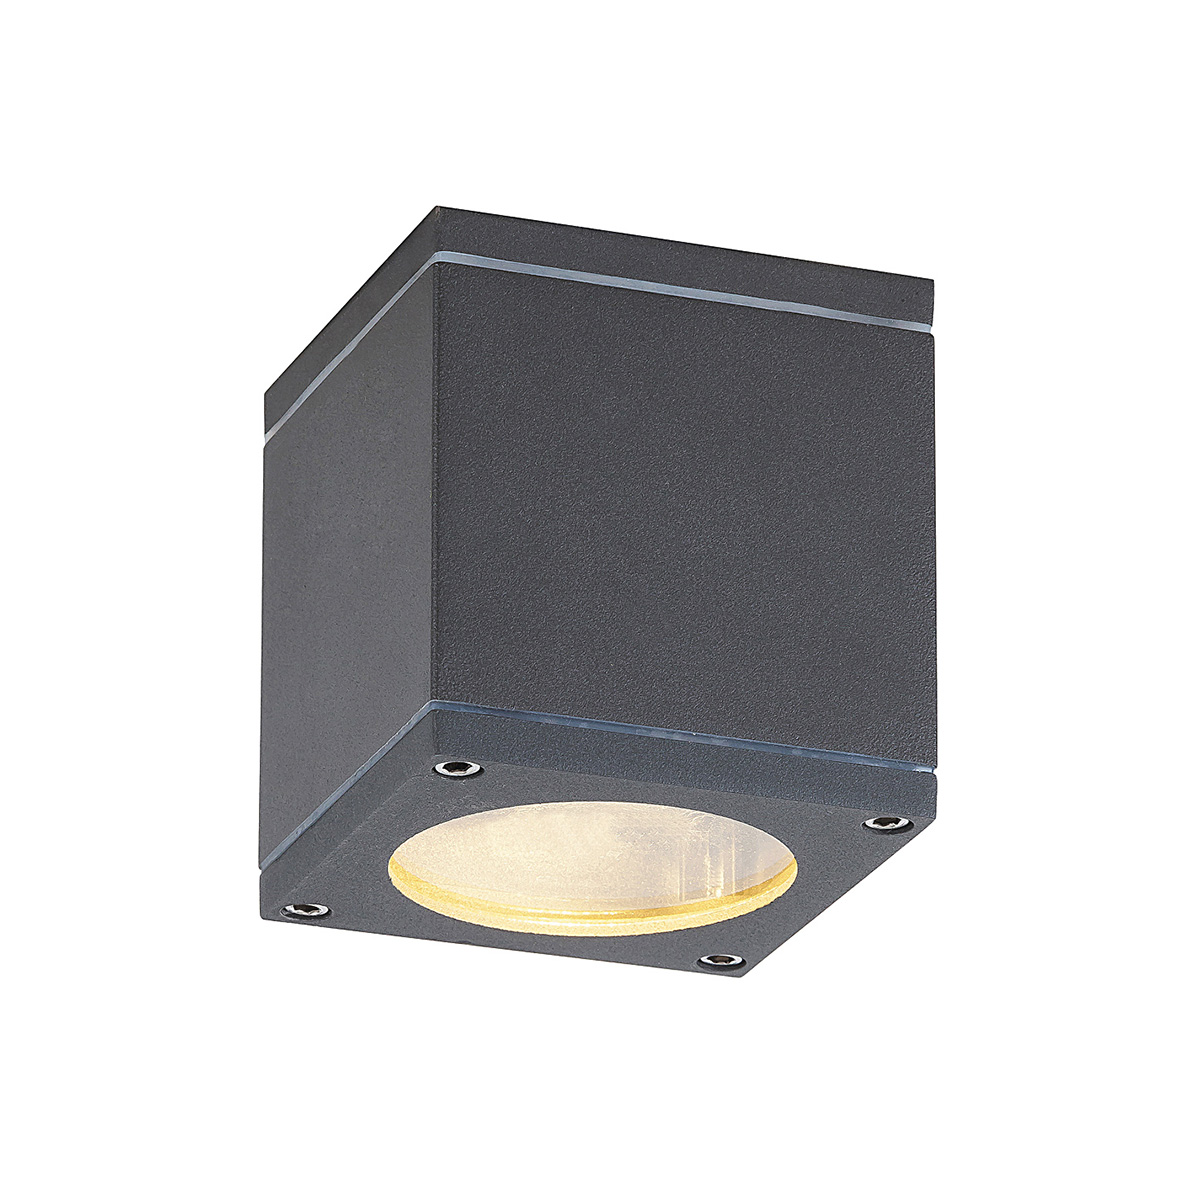 Zidna lampa Akron 8149 siva